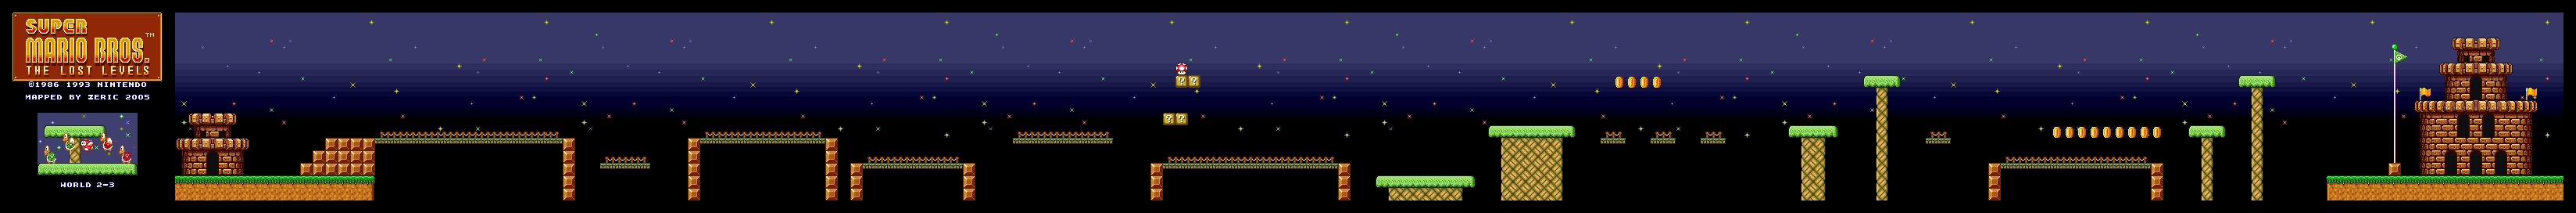 Map of World 2-3 (Super Mario All-Stars version)